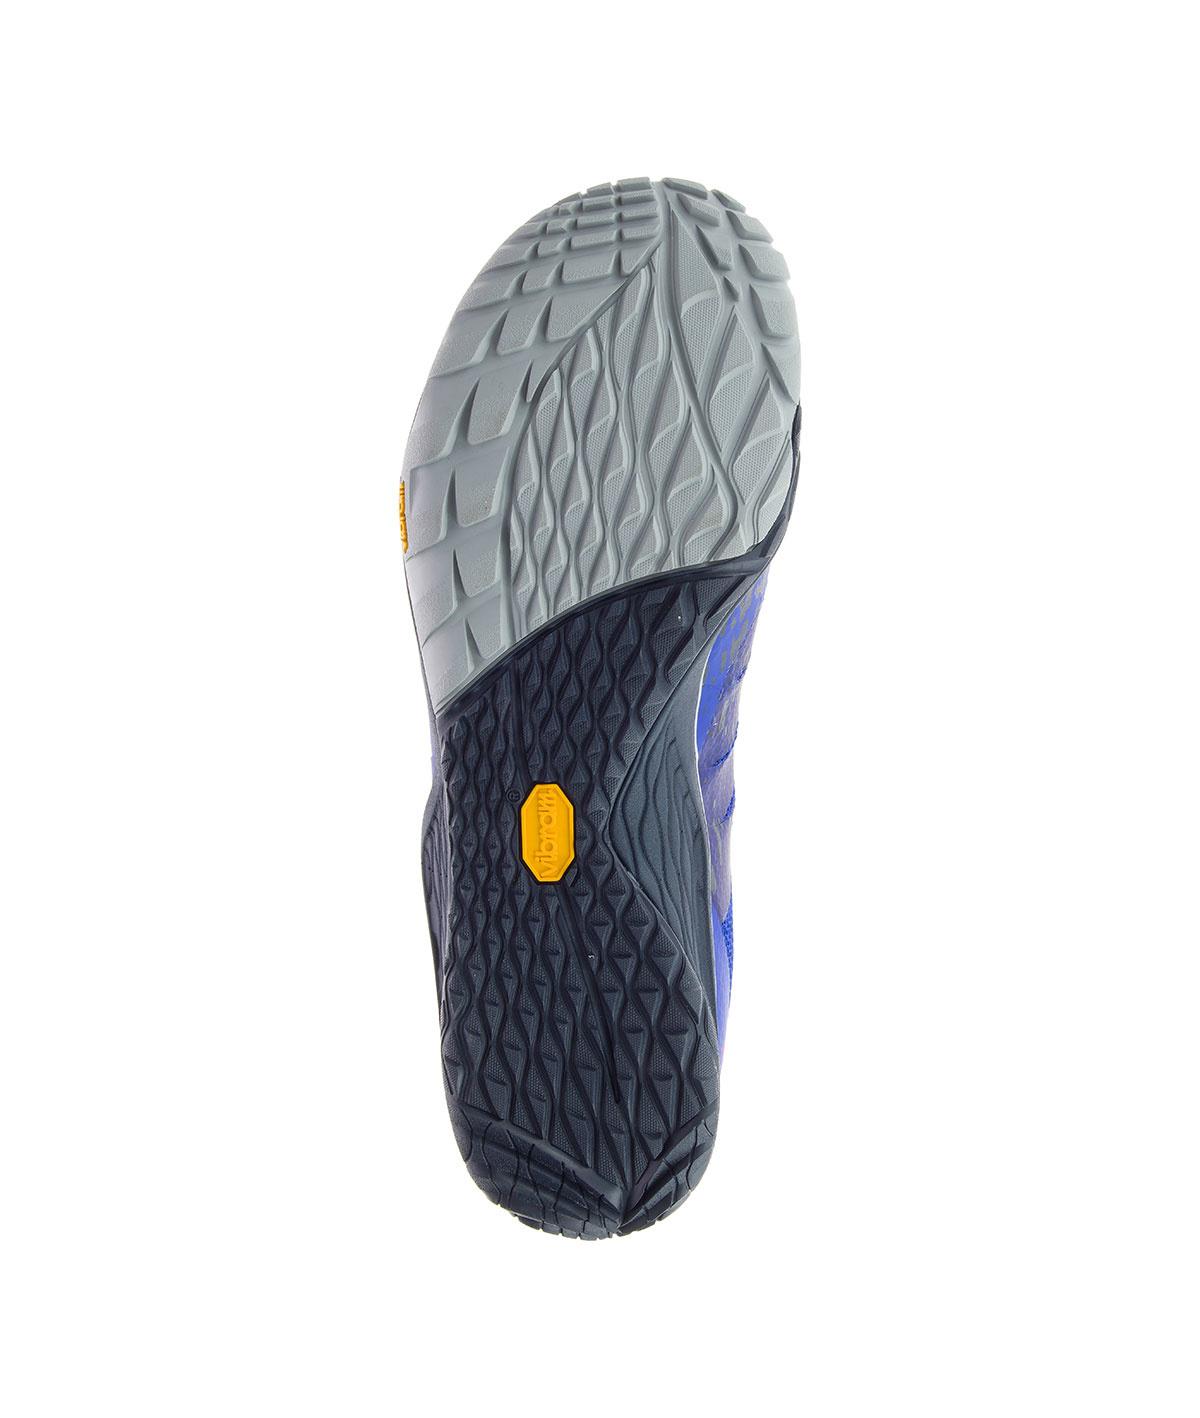 Merrell trail glove 5 j84811 surf the web marine